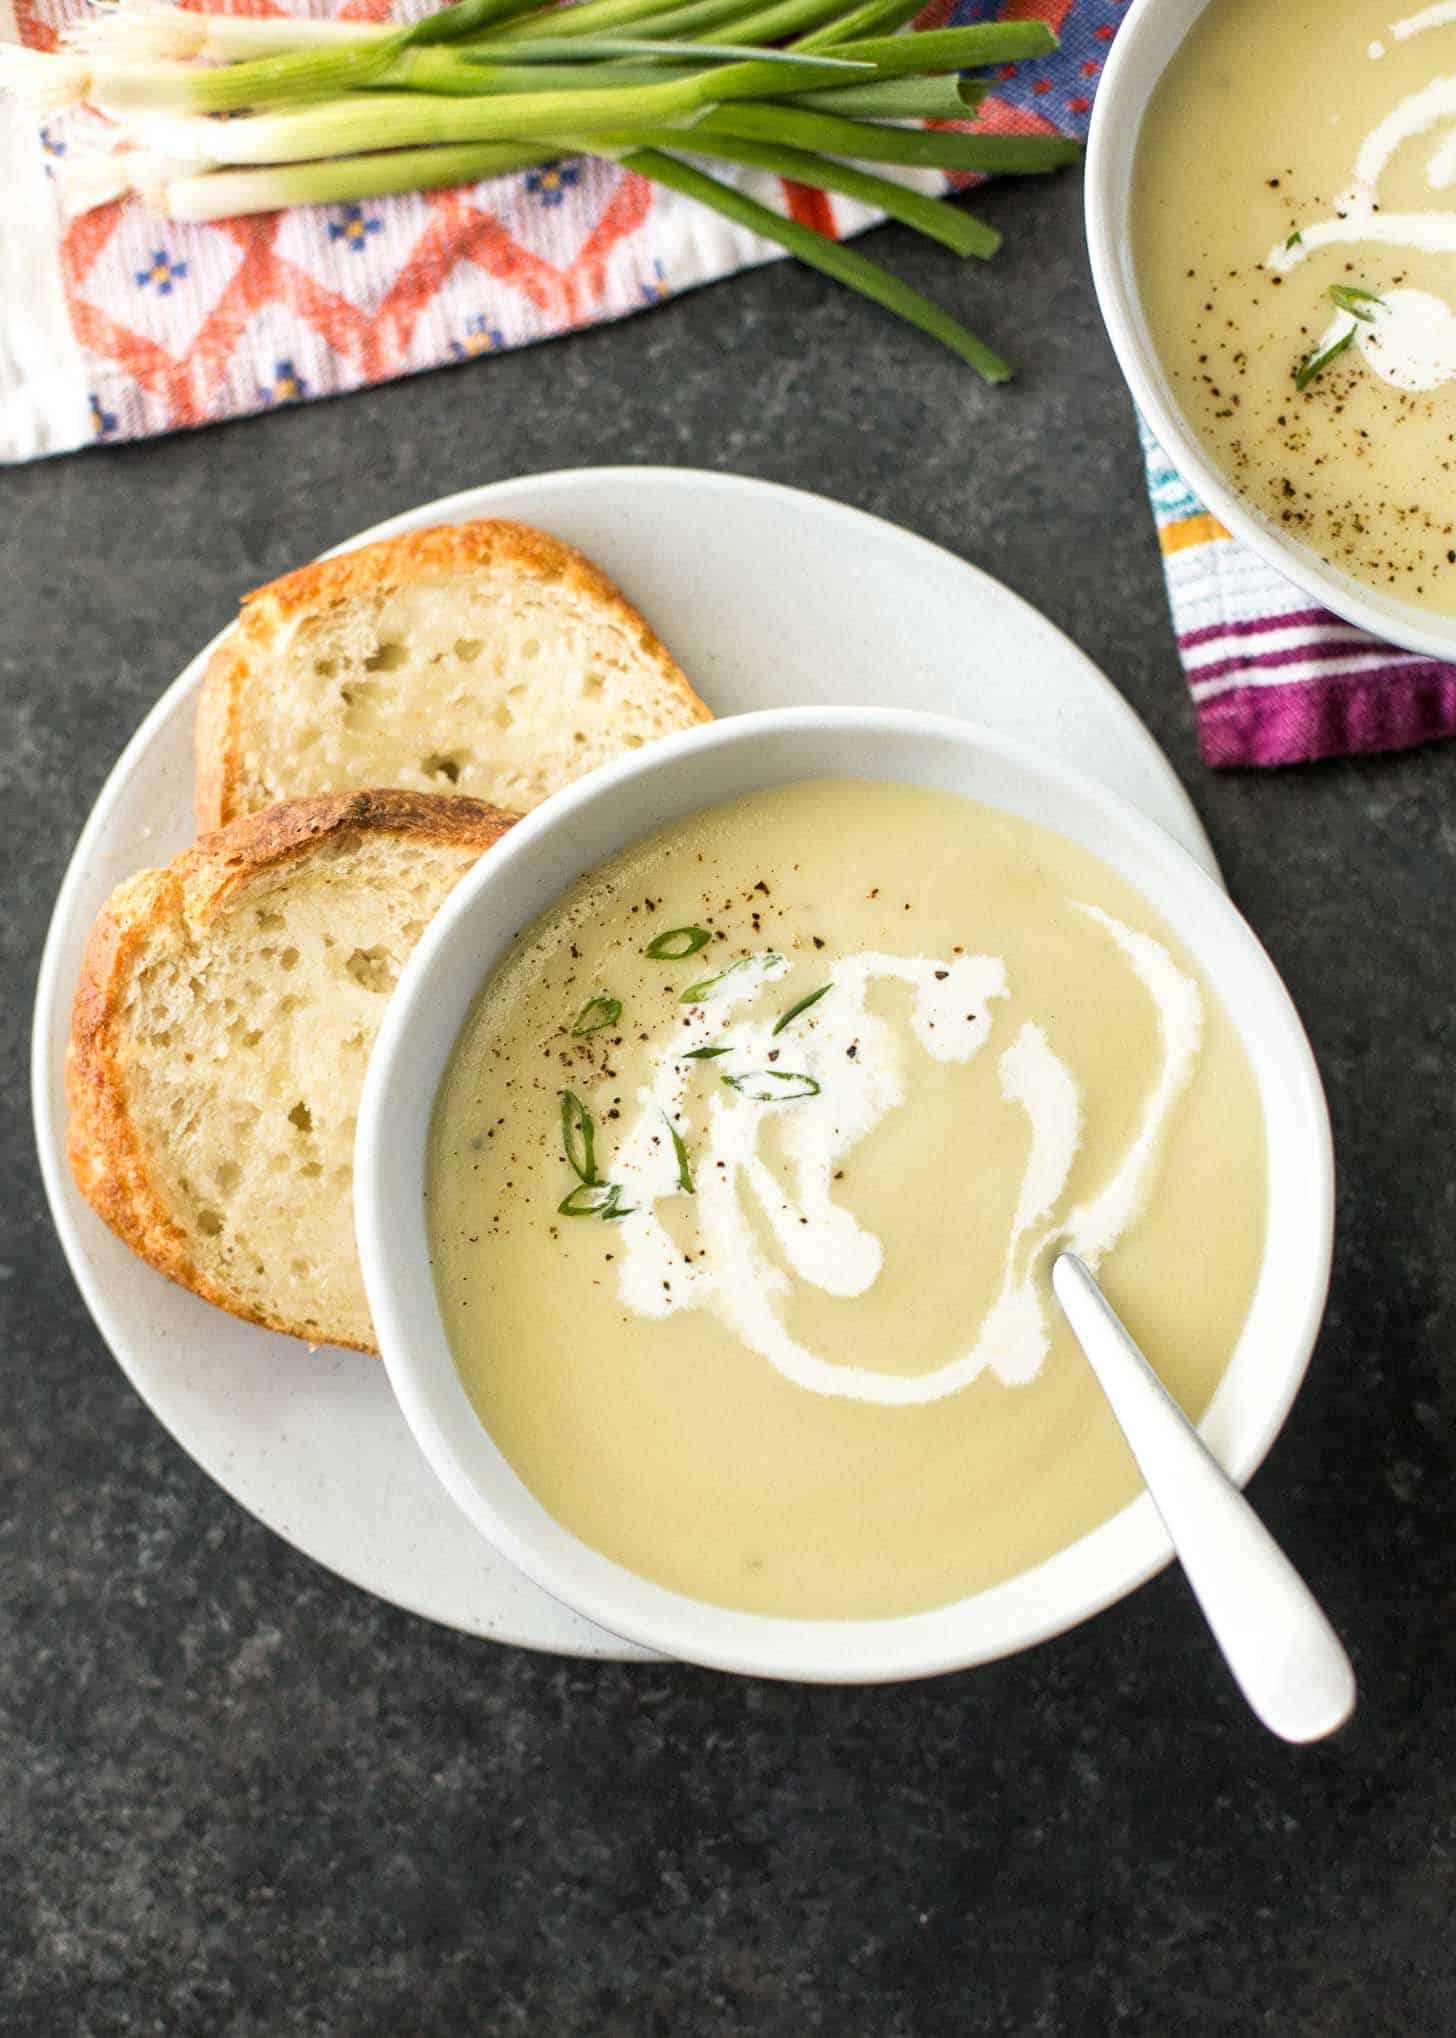 Instant Pot Potato Leek Soup in a white bowl, next to crusty bread